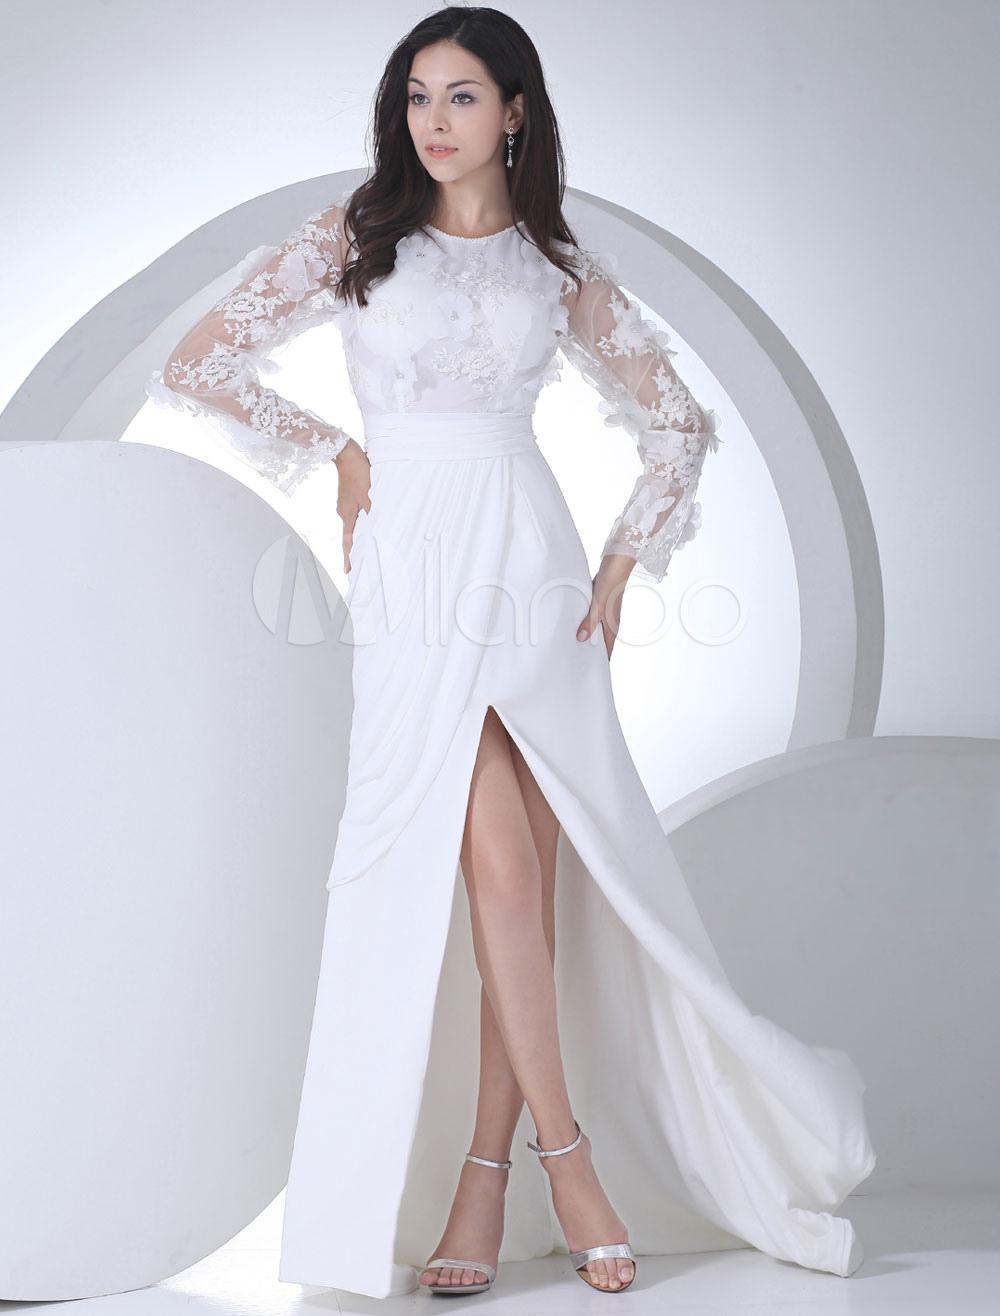 Sheath Wedding Dress Jewel Flower Rhinestone Sleeve Lace Chiffon Pleated Splits Chaple Train Bridal Dress